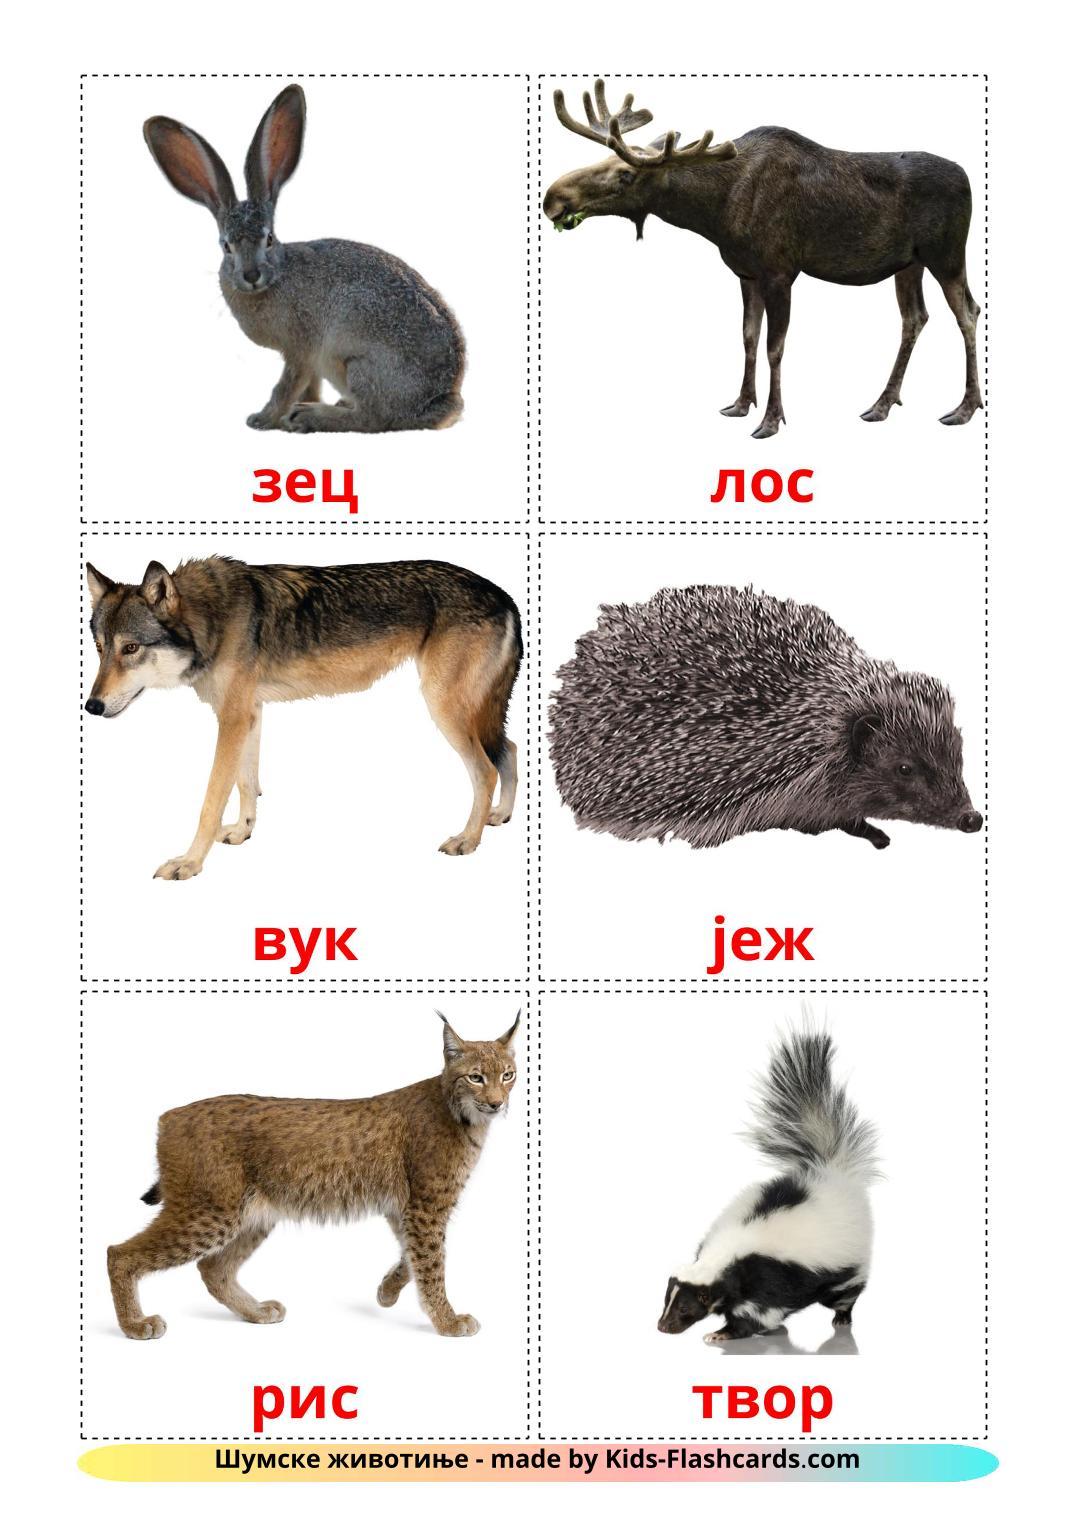 Forest animals - 22 Free Printable serbian(cyrillic) Flashcards